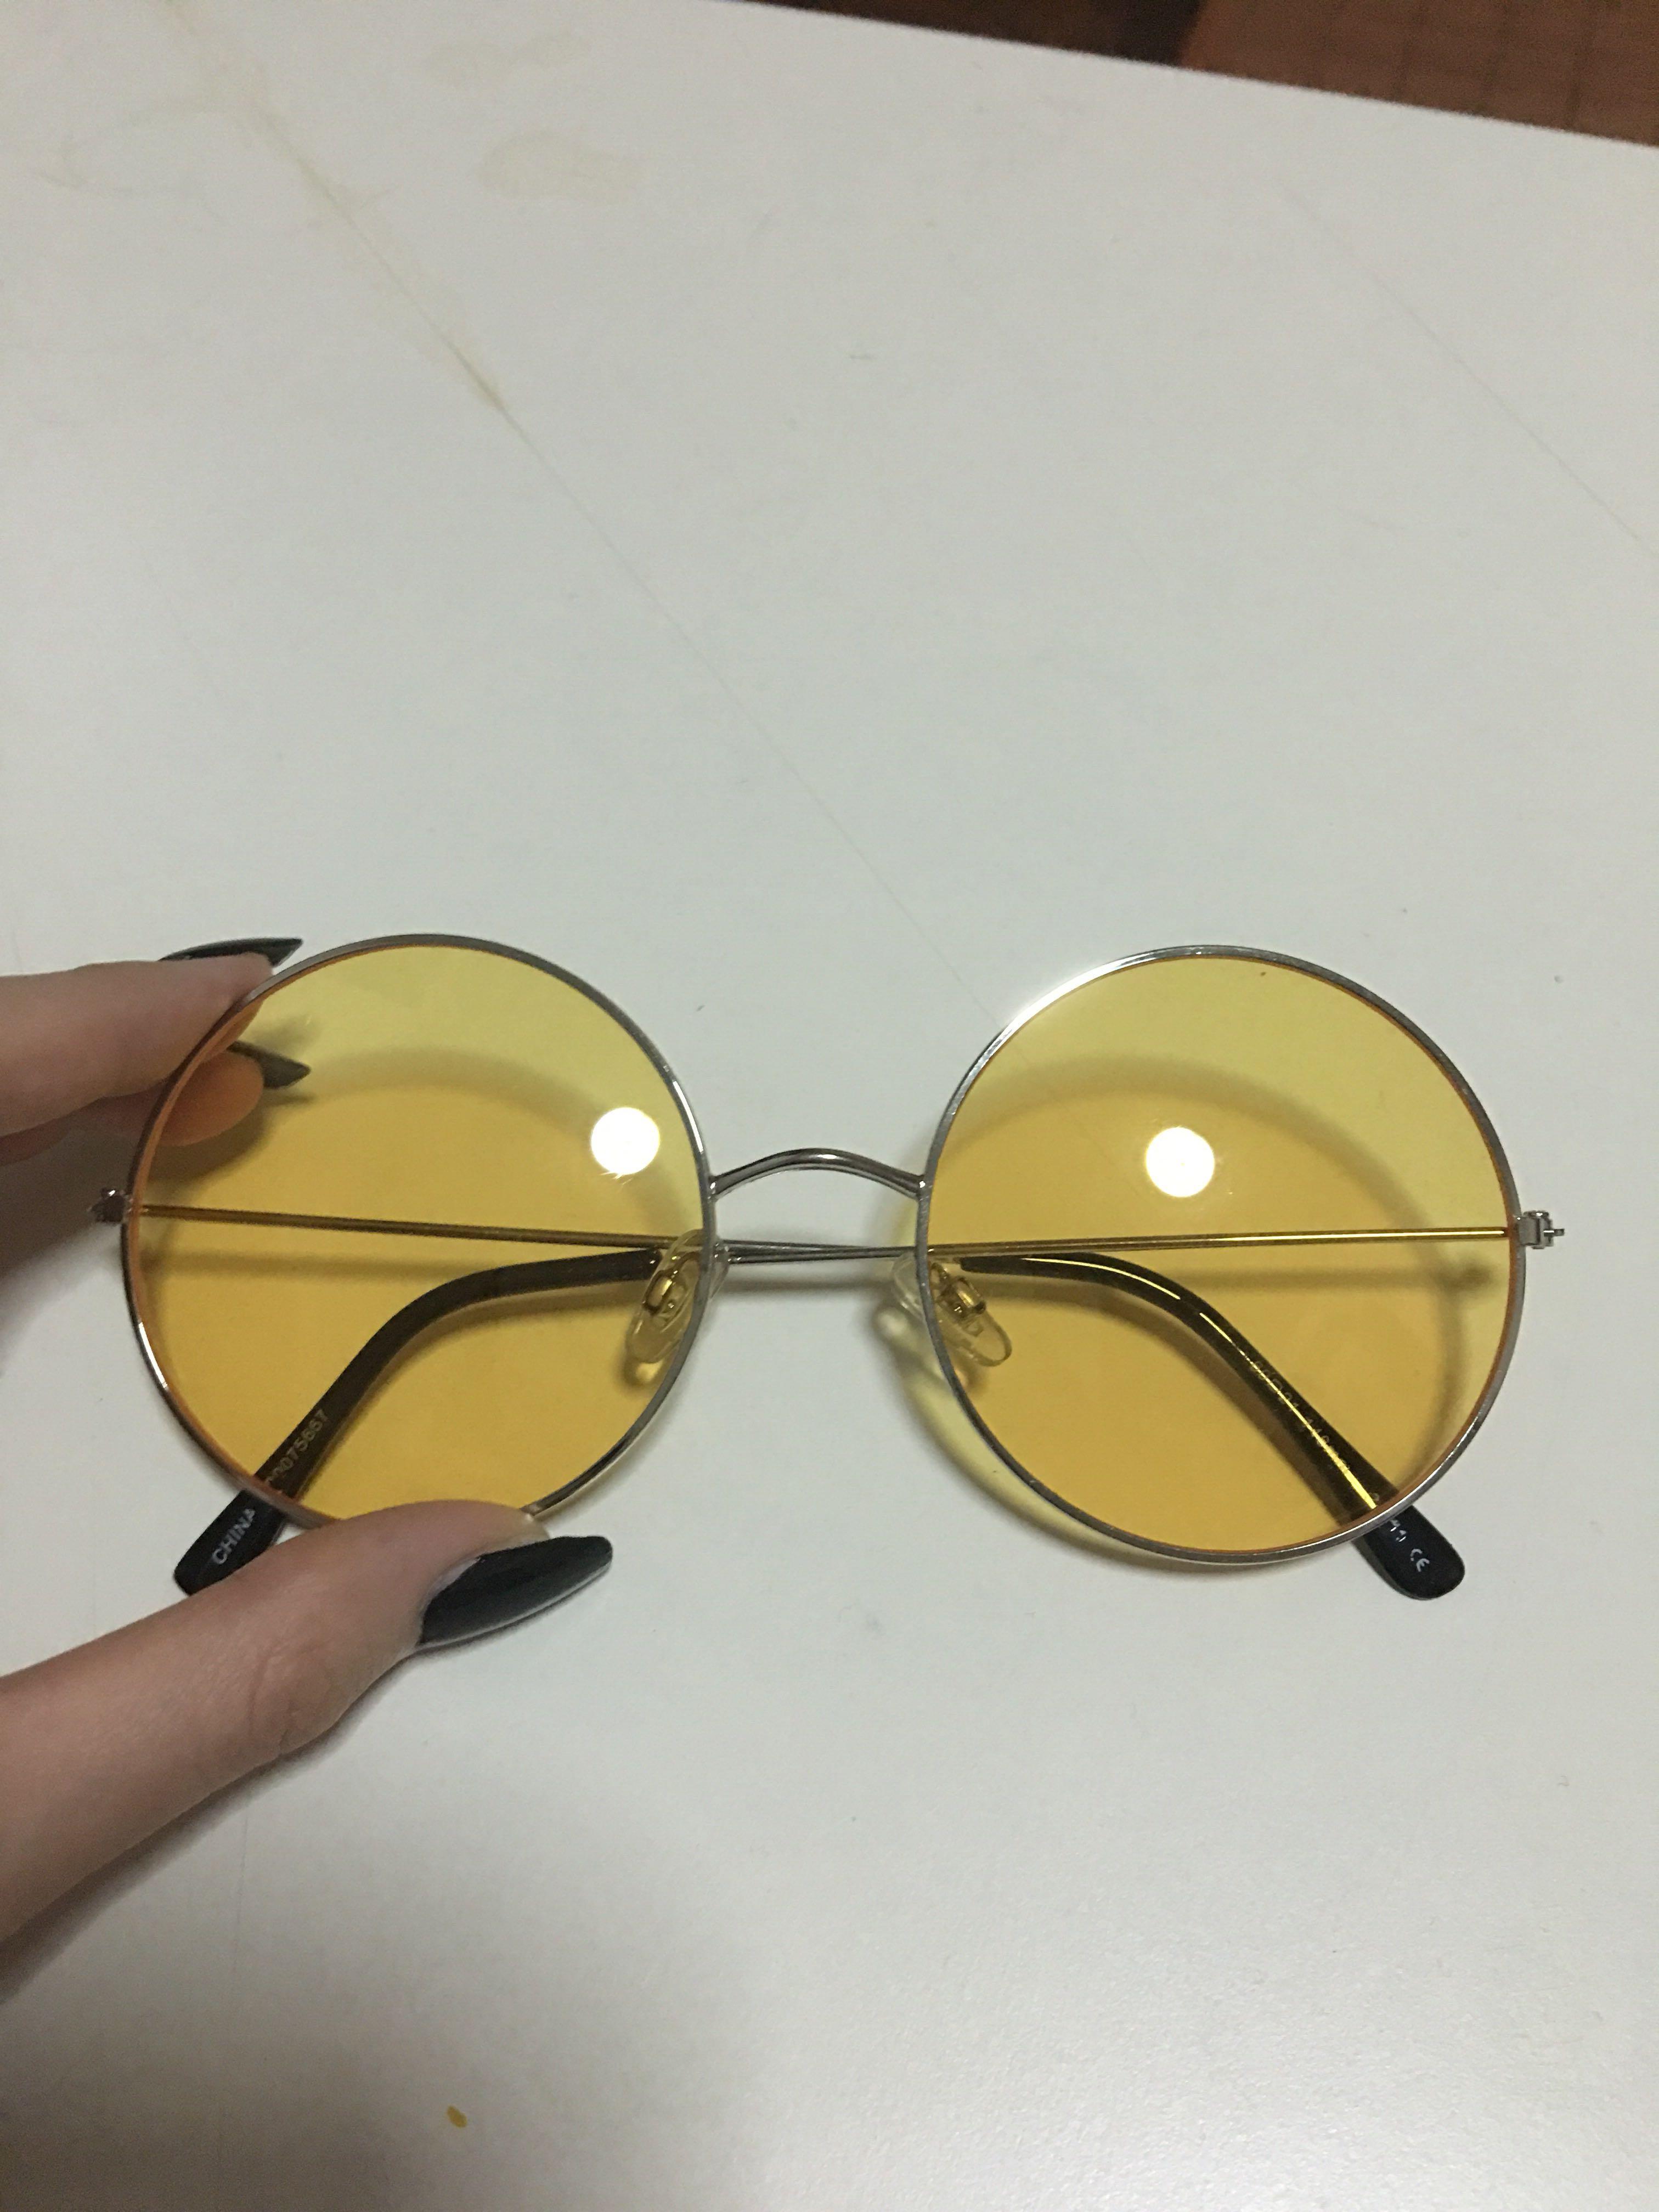 3c93d4e65bd Forever 21 Yellow Tint Sunglasses